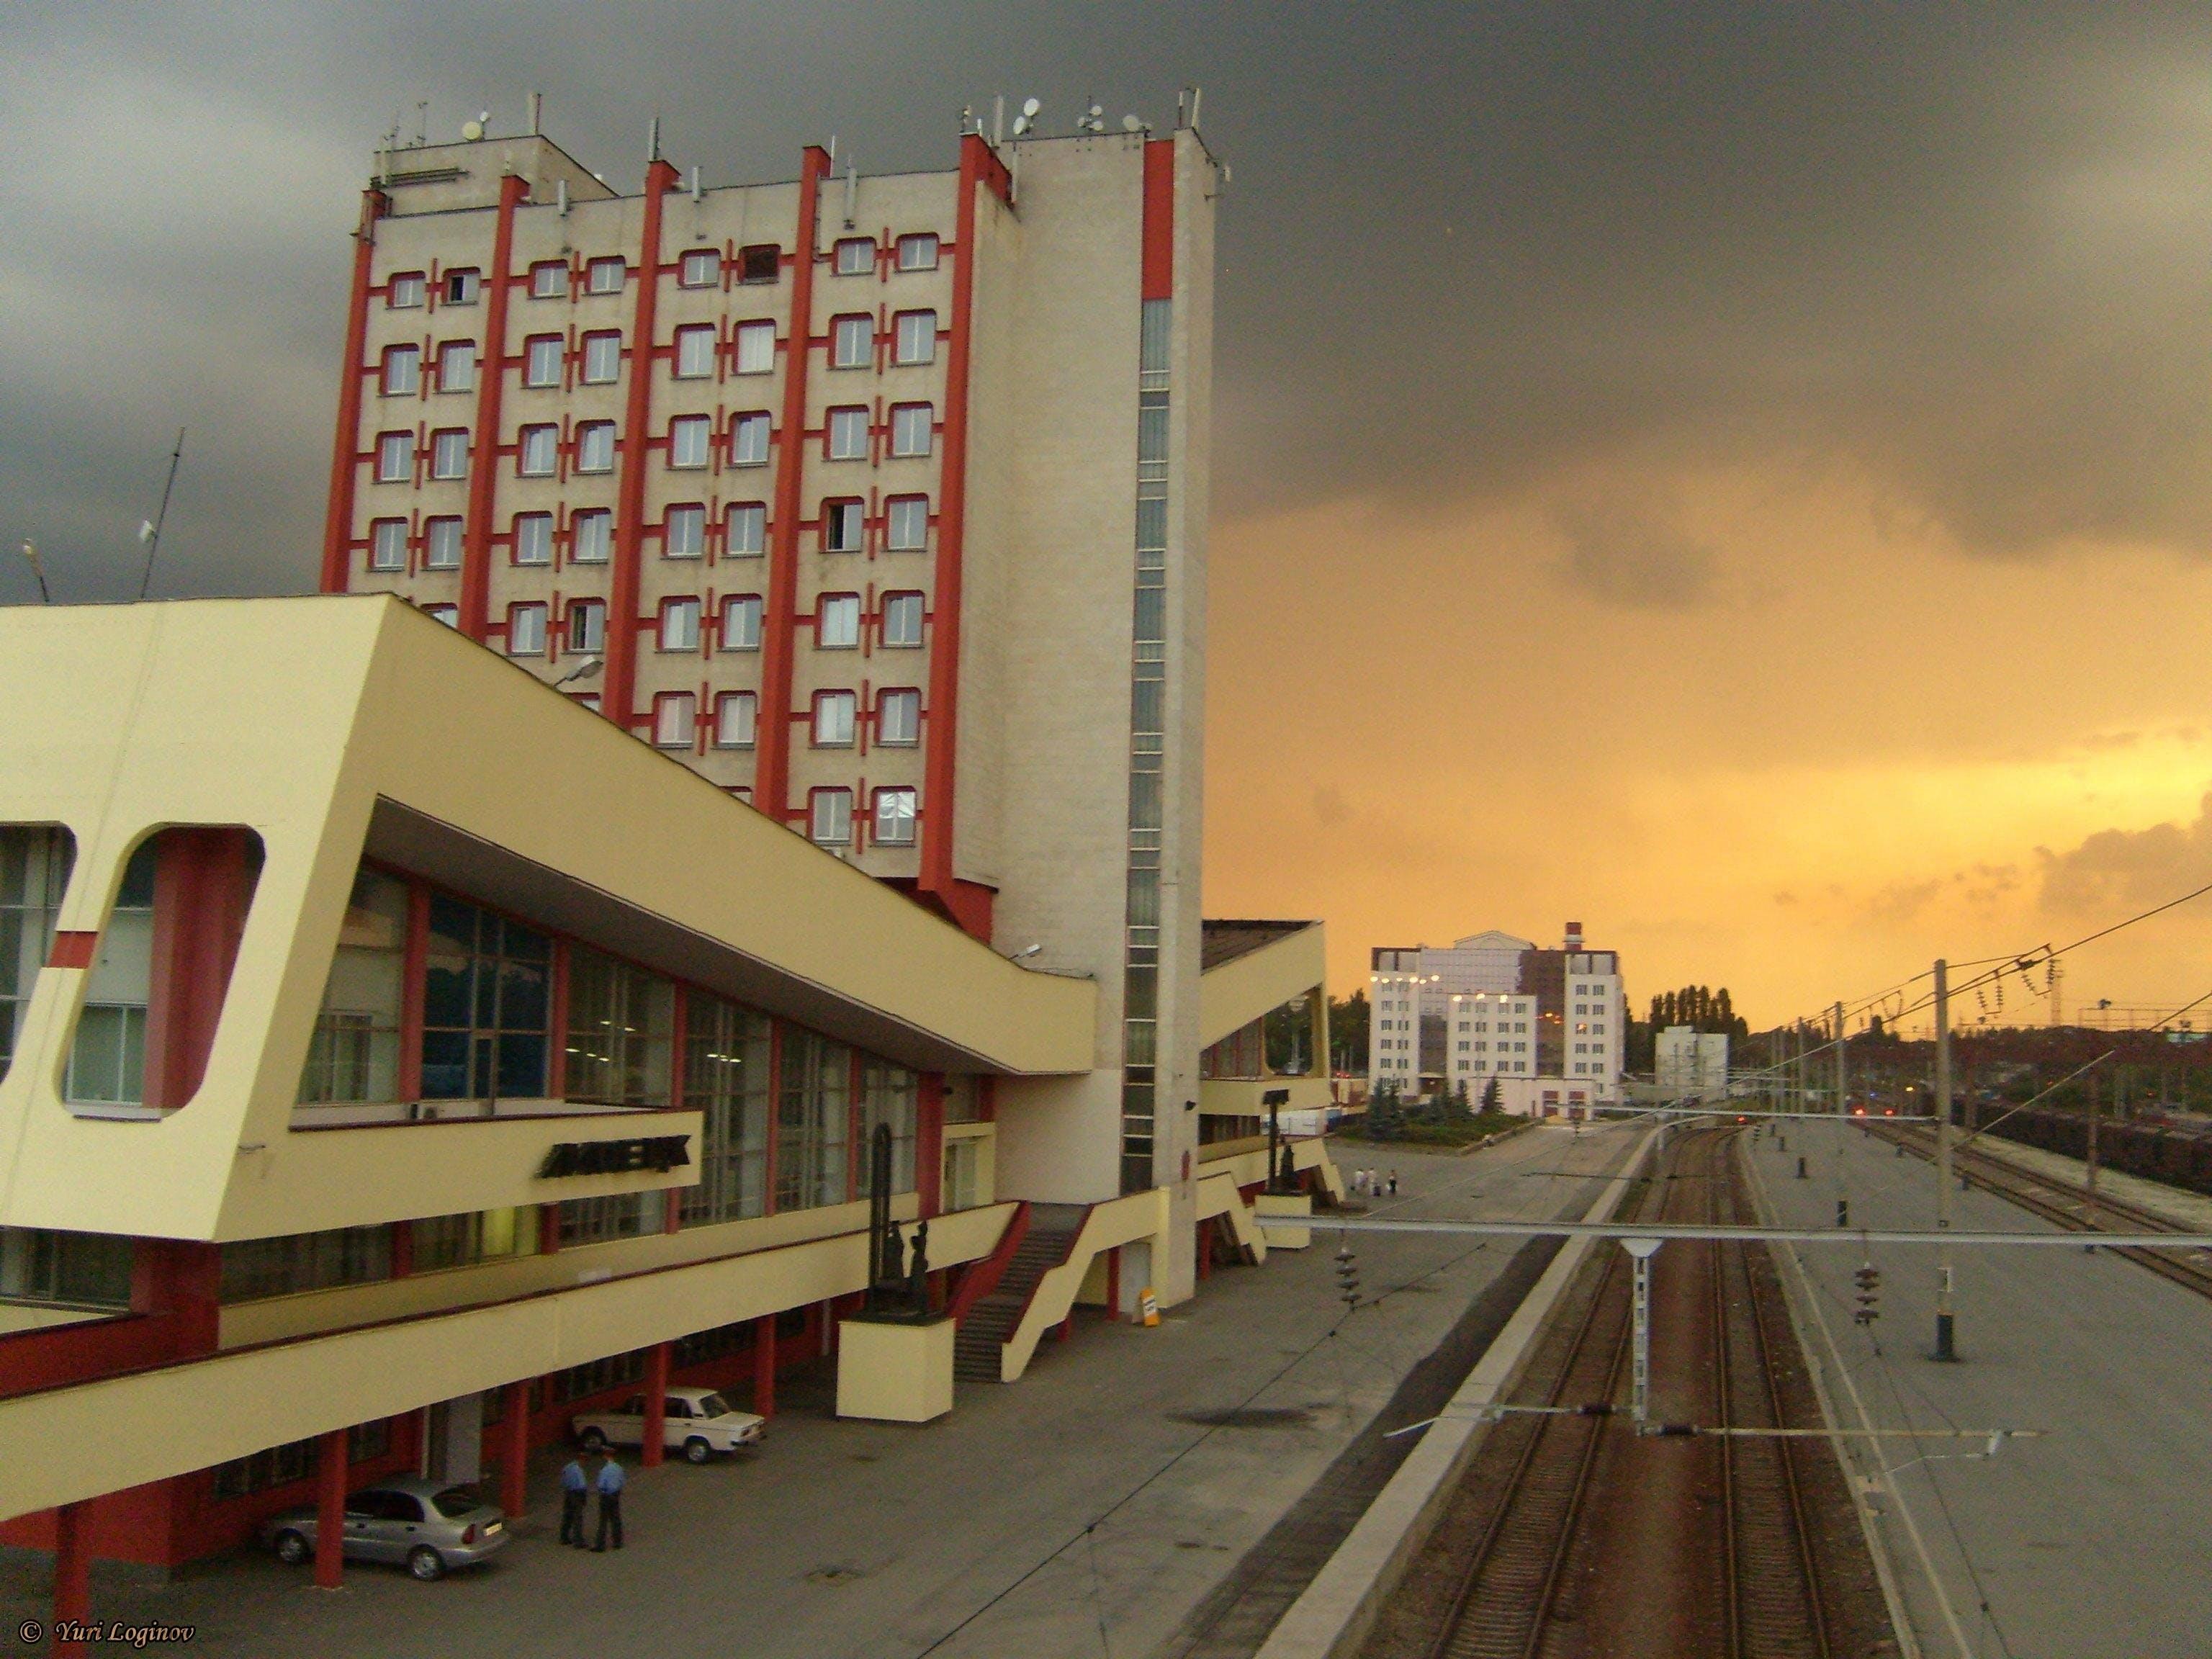 Free stock photo of Lipetsk, Lipetsk Station, россия, russia